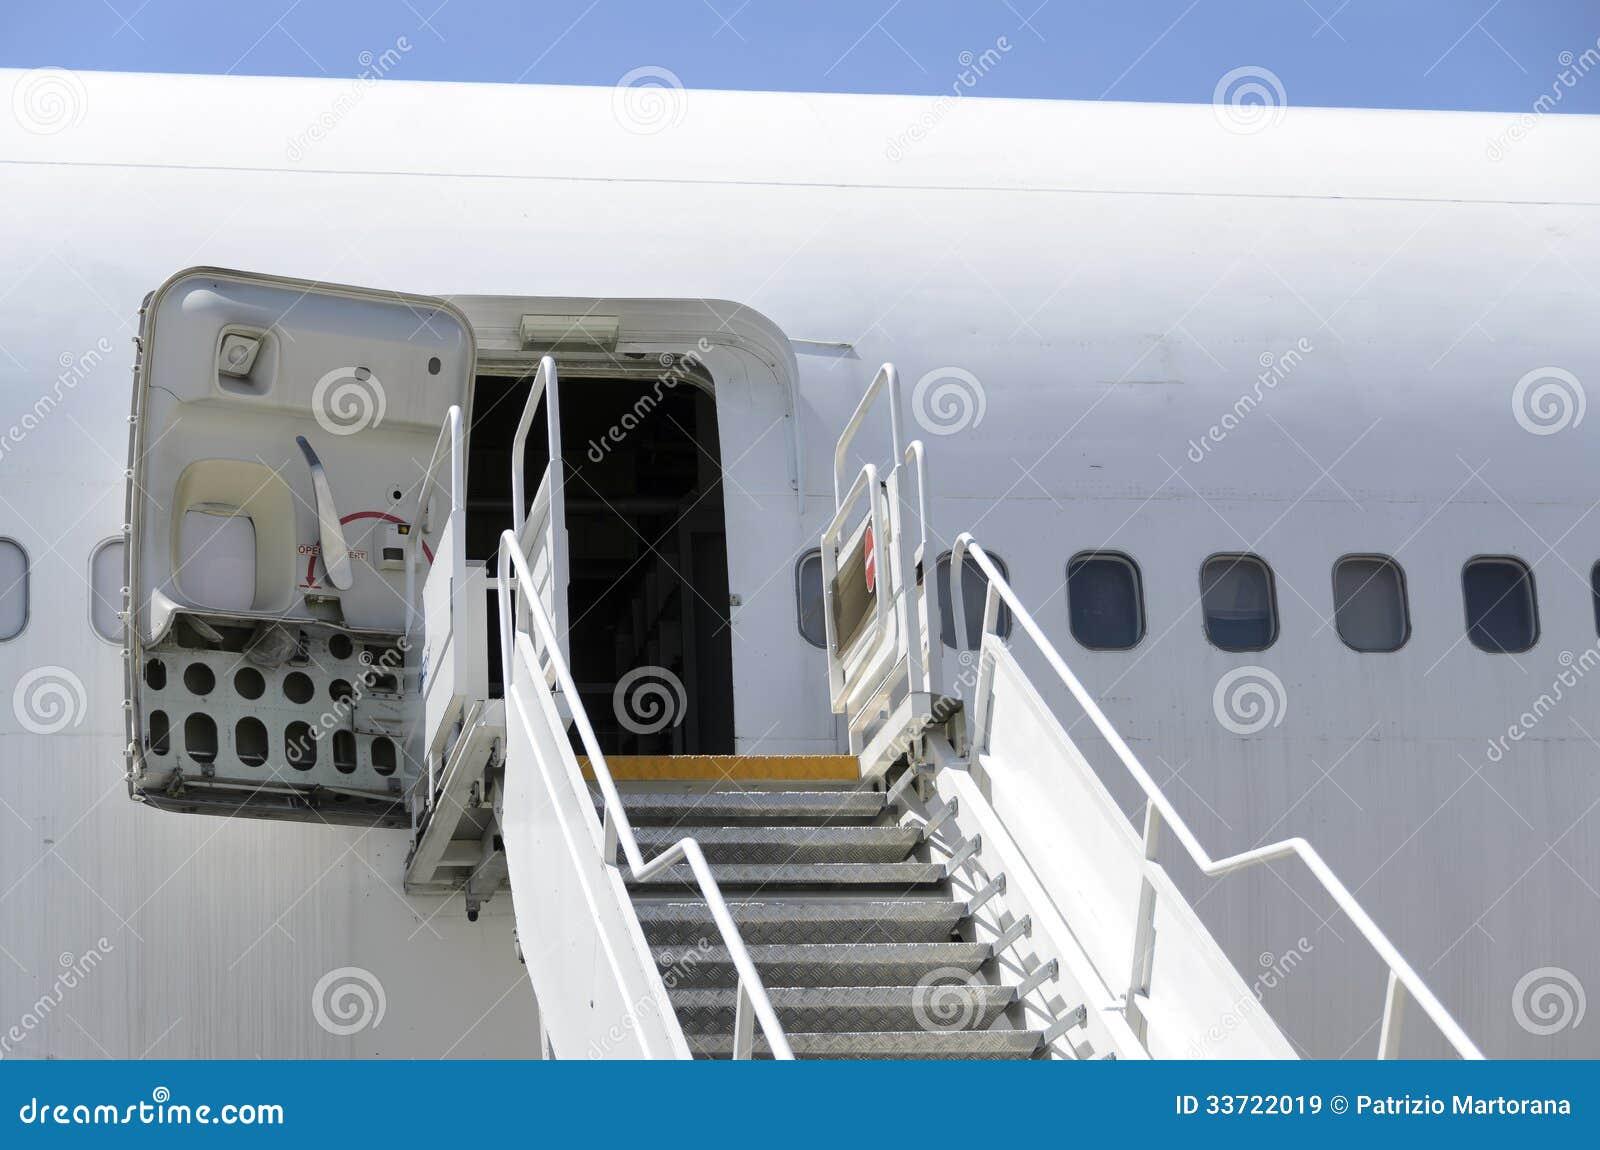 Boeing 747 Stairs. Stock Image. Image Of Paris, City